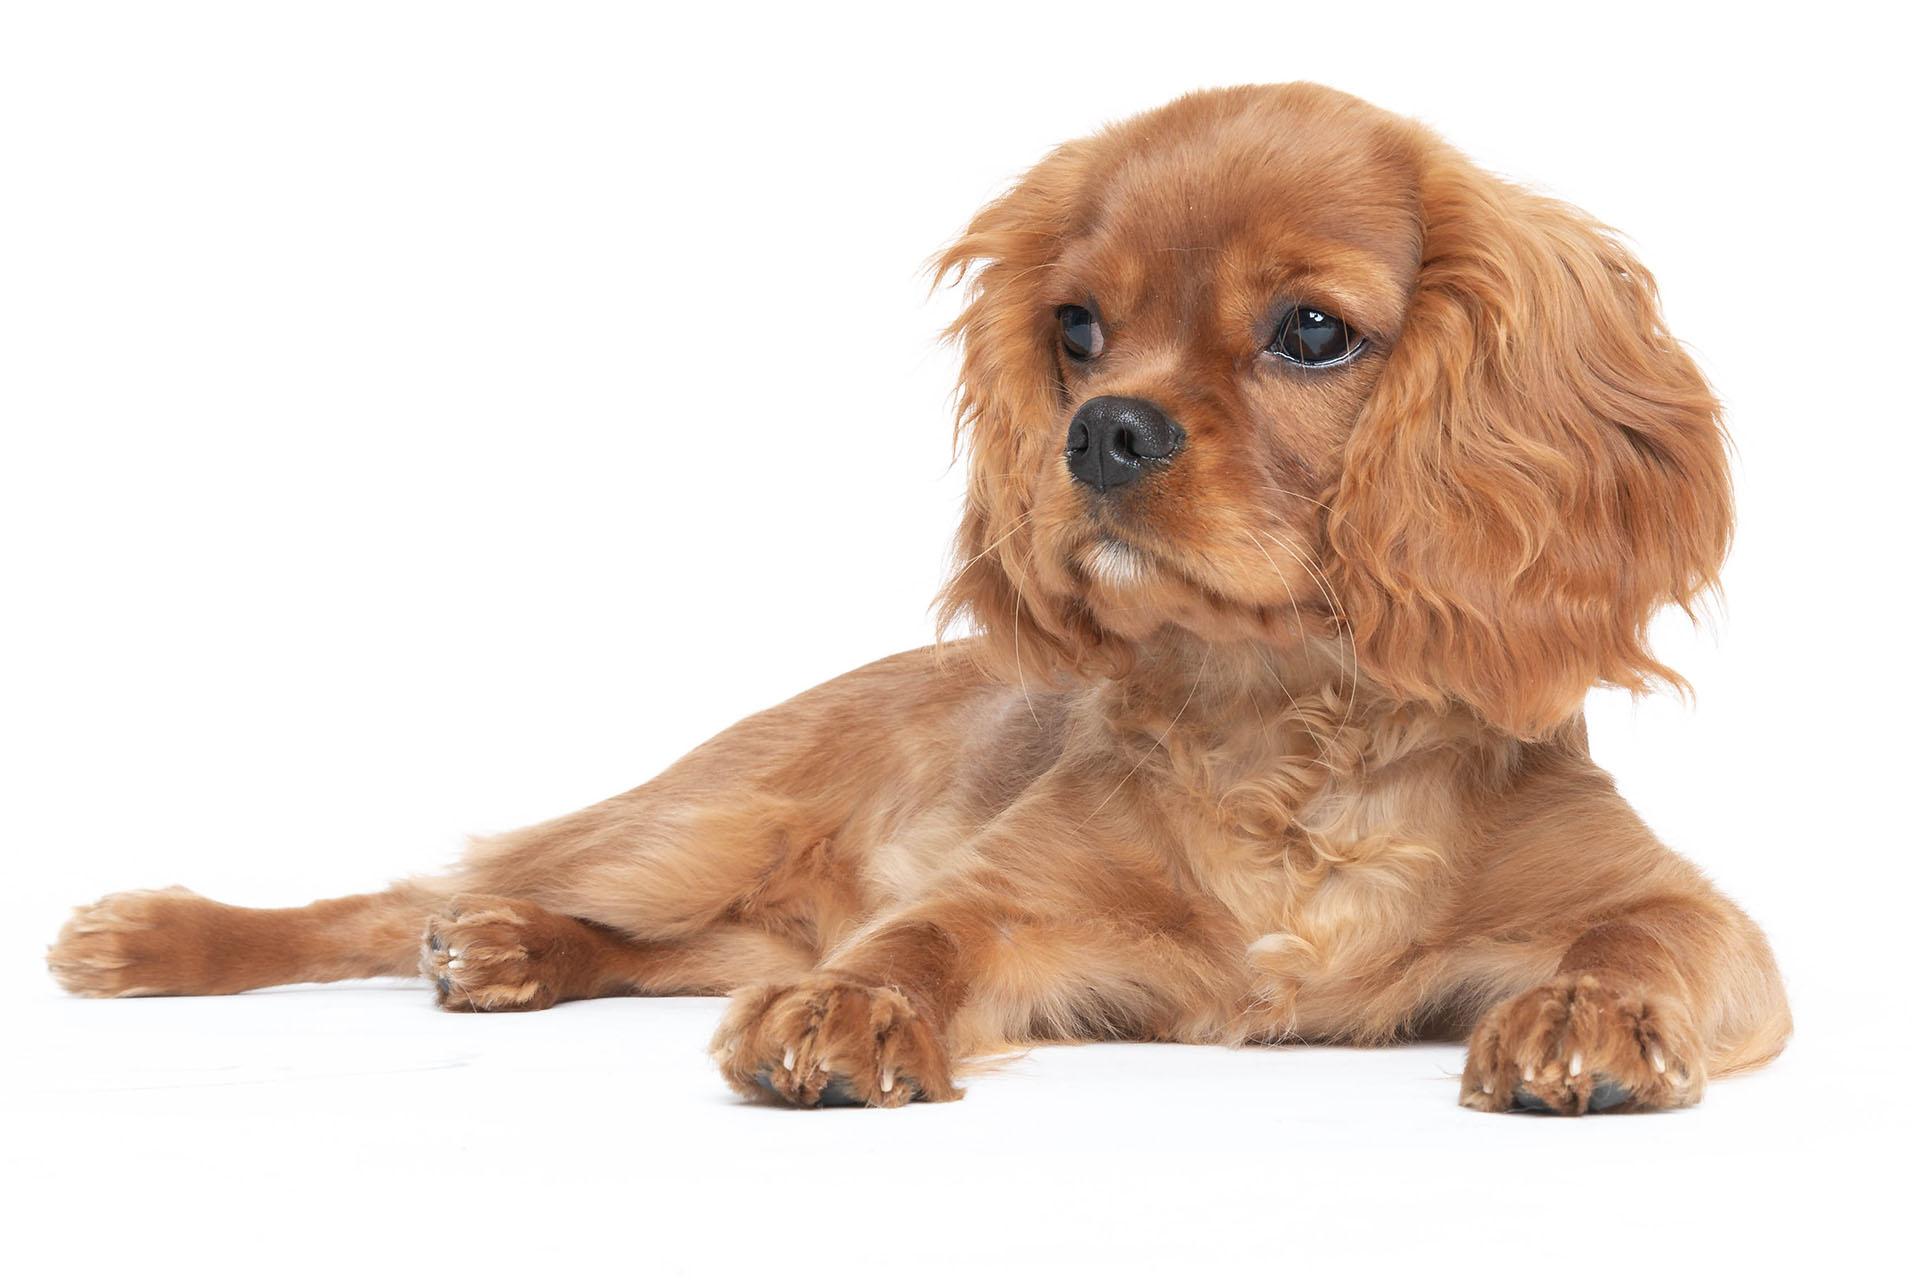 Doggie Photo Shoot at the Charlecote Pheasant Hotel